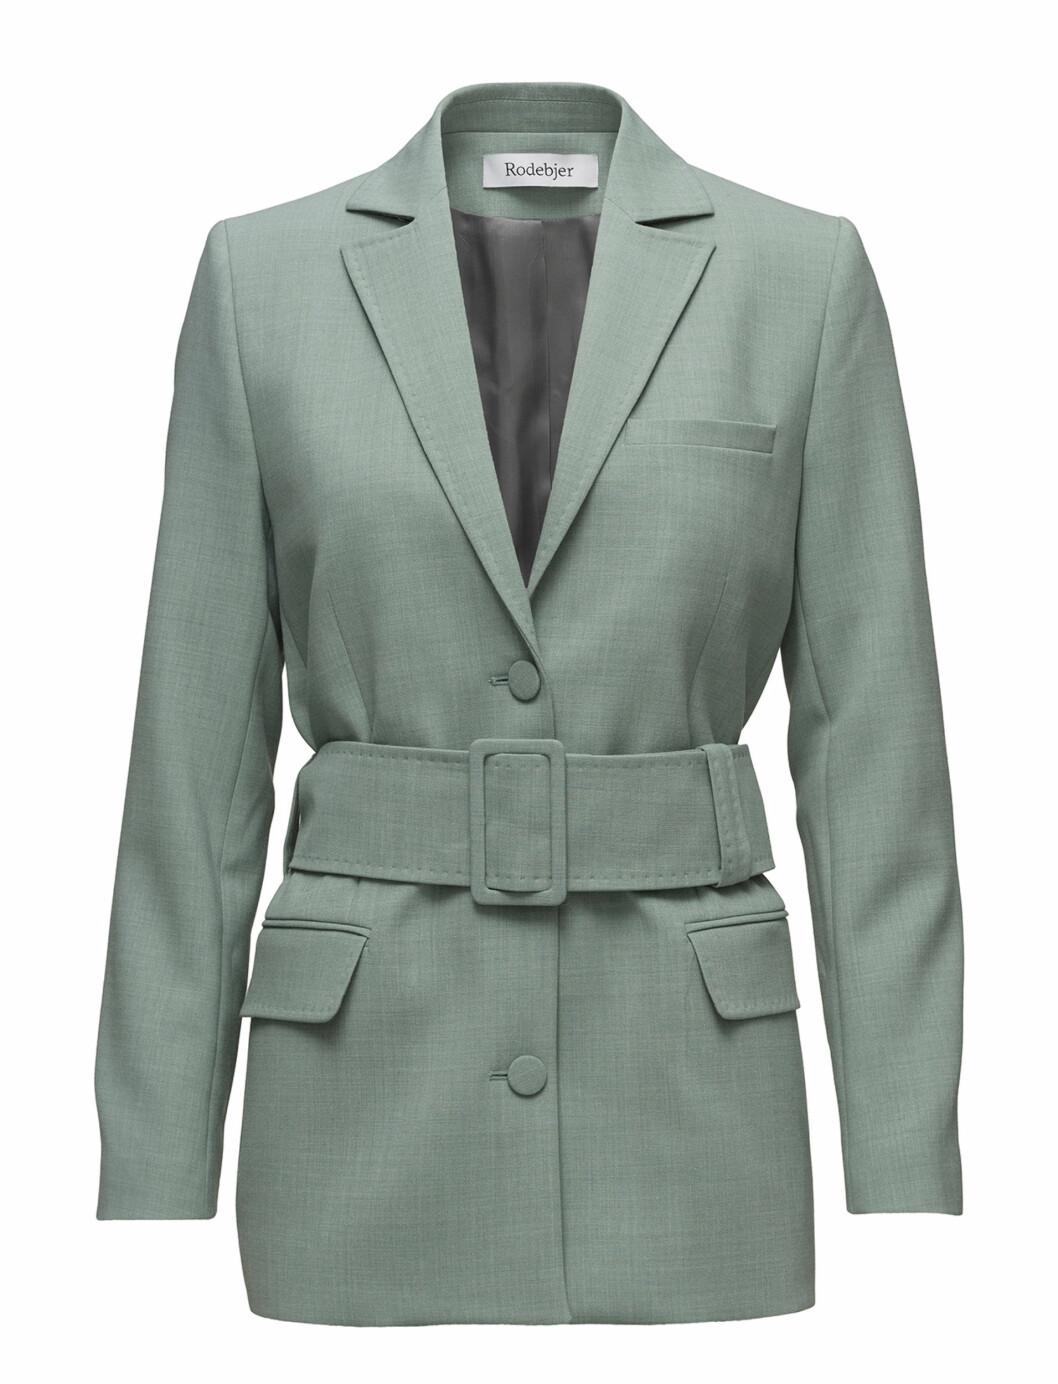 Dressjakke fra Rodebjer via Boozt.com |4295,-| https://www.boozt.com/no/no/rodebjer/anitalia-suit_16668318/16668323?navId=67743&group=listing&position=1500000